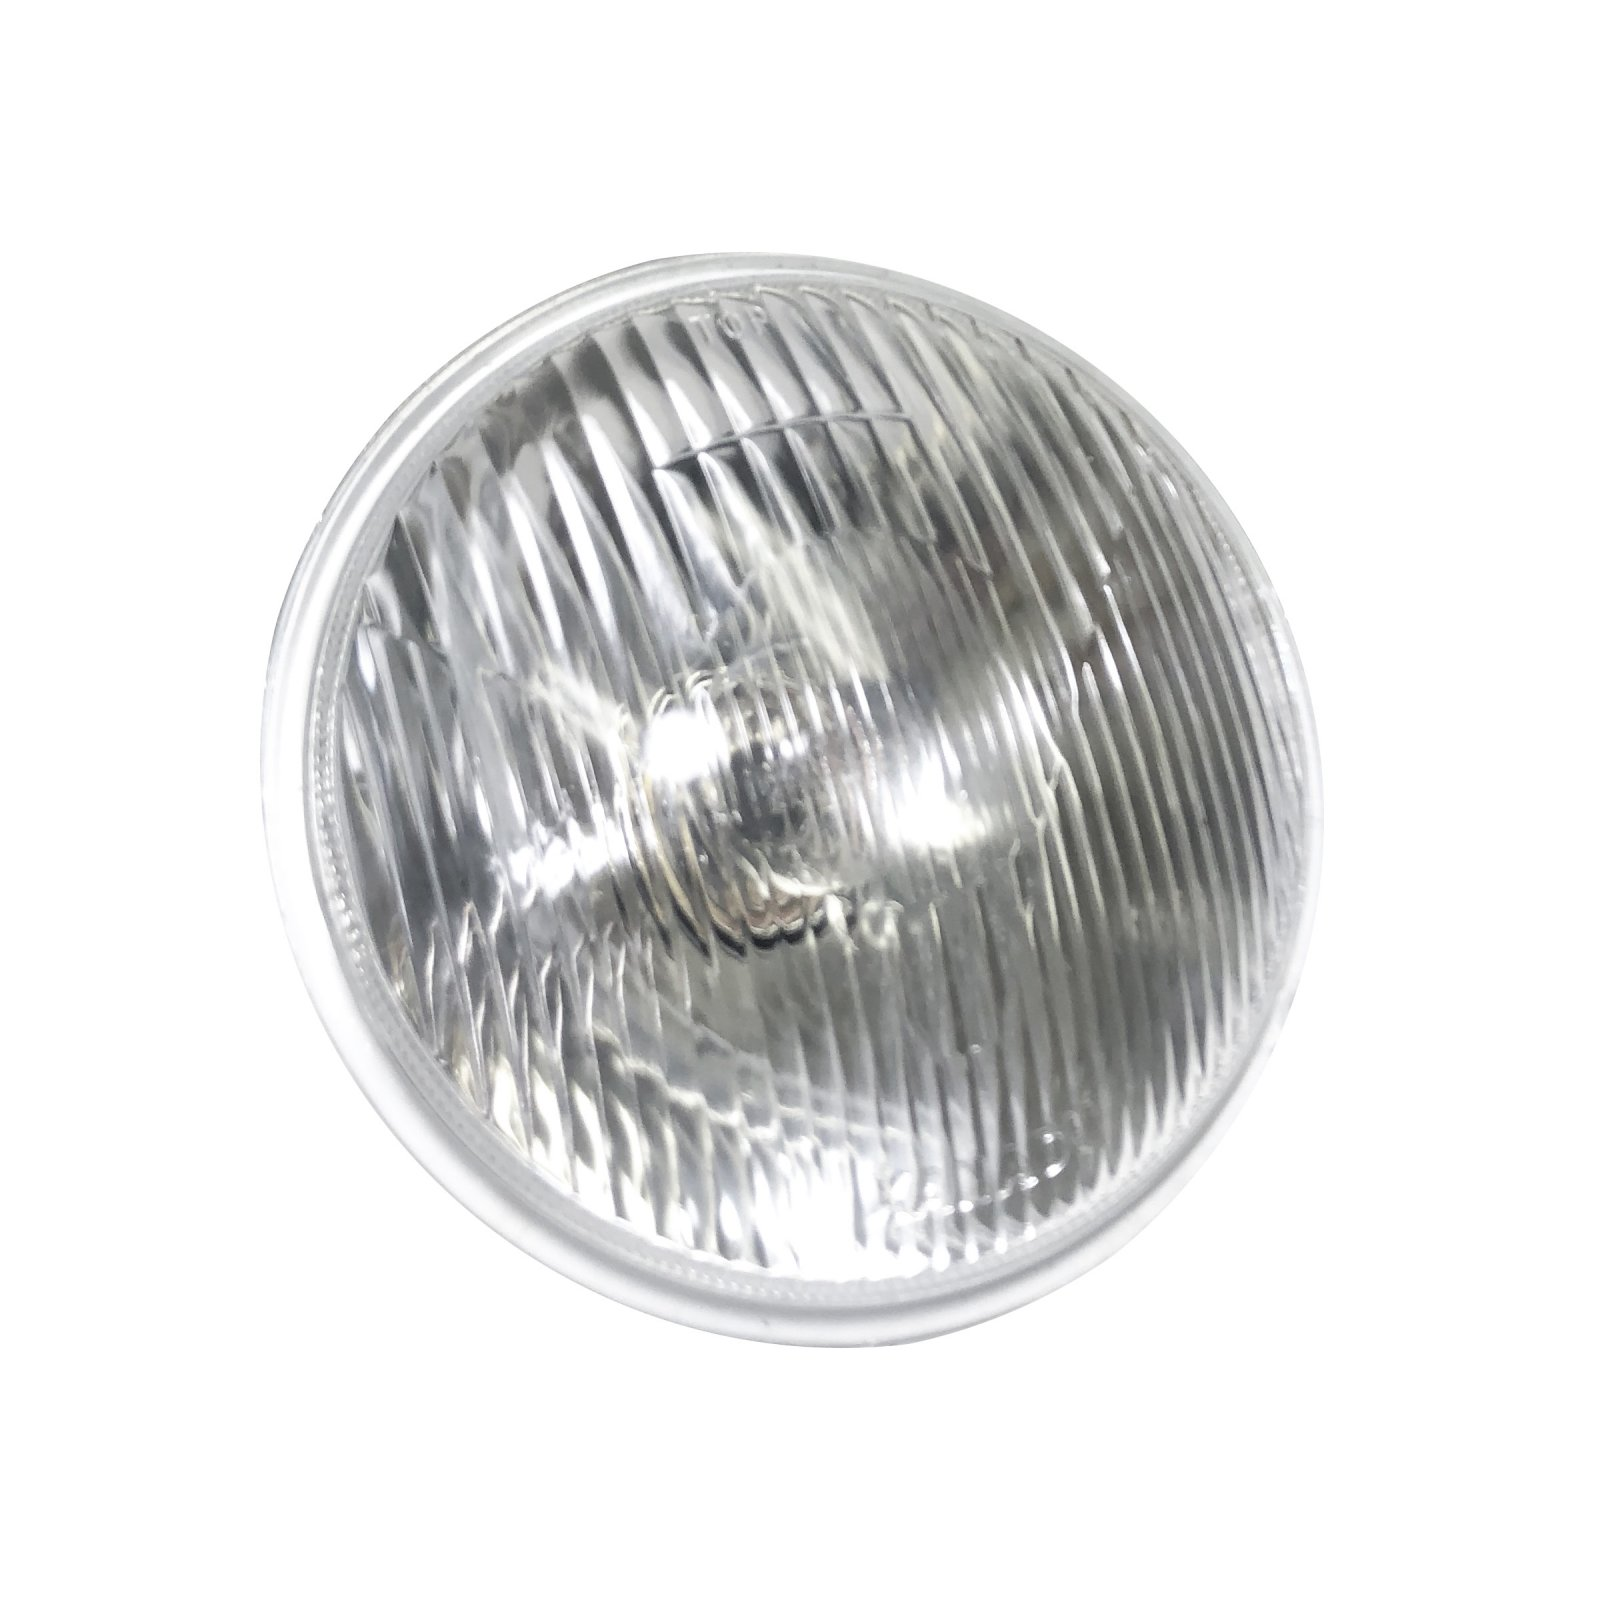 hight resolution of yamaha dt125 dt175 dt250 dt360 dt400 xt125 xt250 xt500 headlight lamp 6v 35 35w 26 032